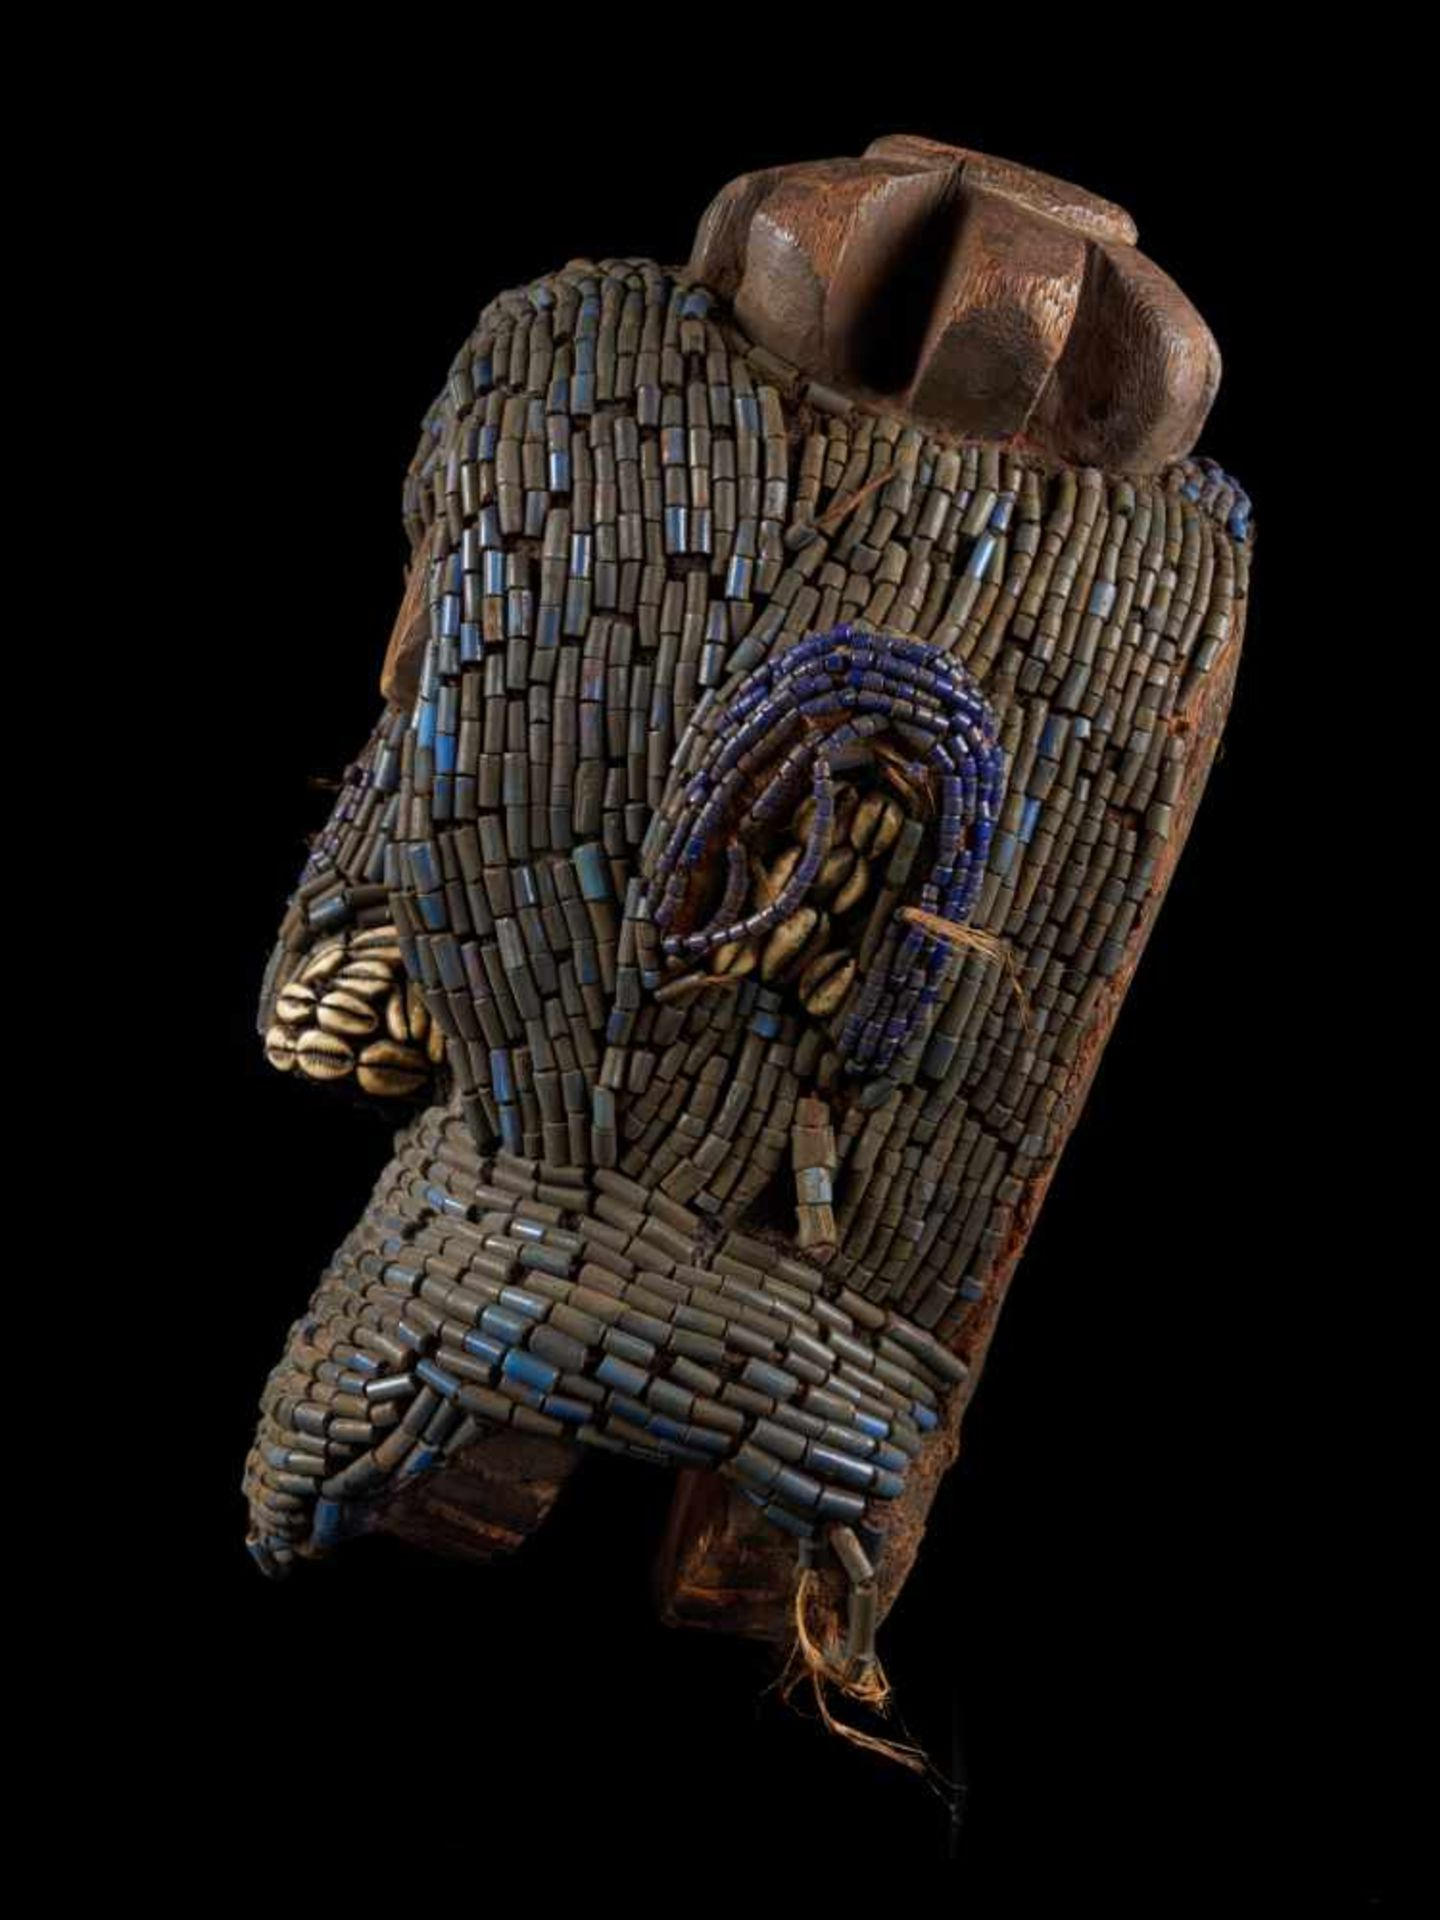 Beaded Gorilla Mask With Wooden Headdress - Tribal ArtA beautiful gorilla mask fashioned from wood - Bild 2 aus 7